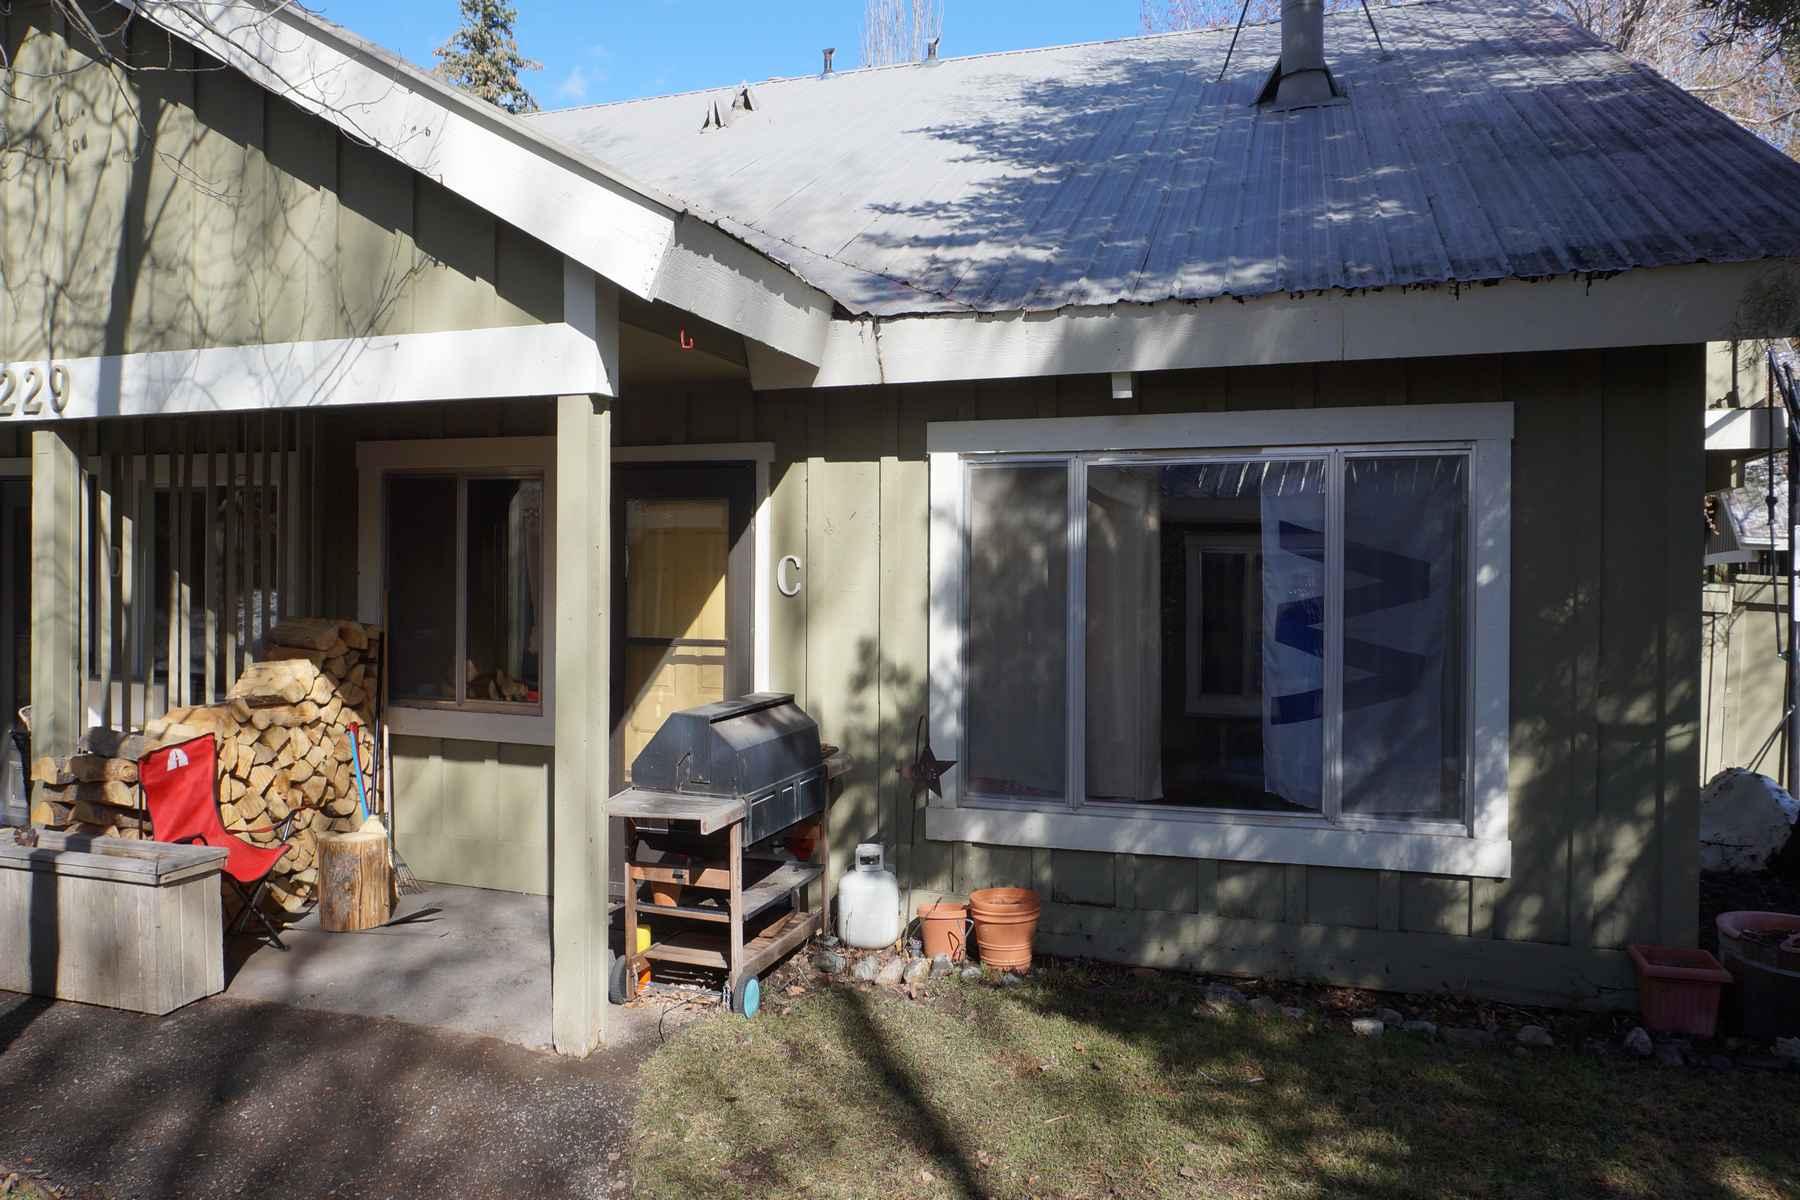 Additional photo for property listing at Great Location Condo 229 Pinewood Ln #C14 Ketchum, Idaho 83340 Estados Unidos